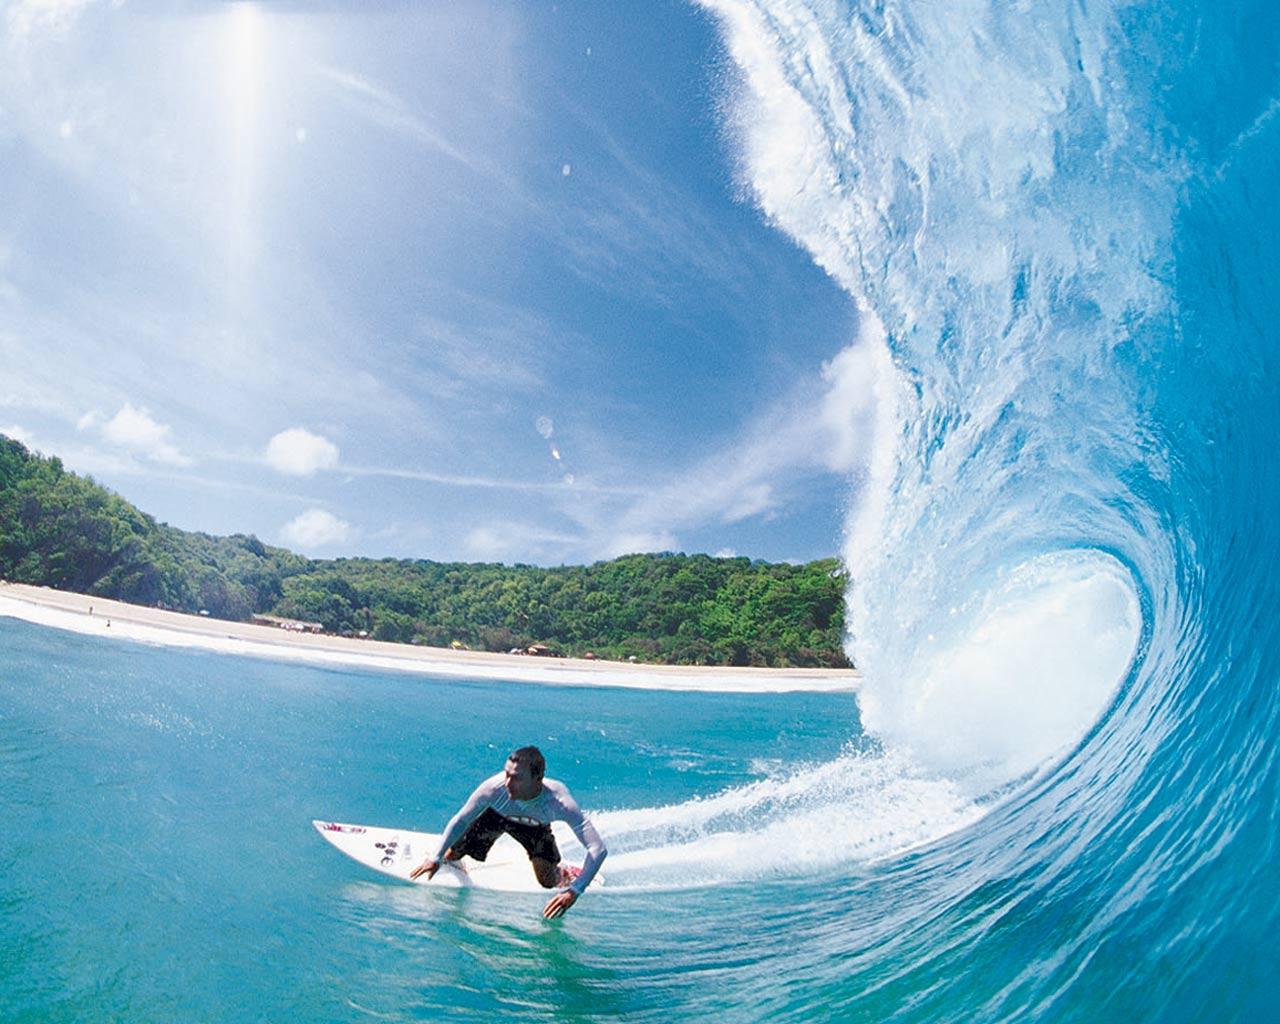 bali-watersports Bali Water Sports Package